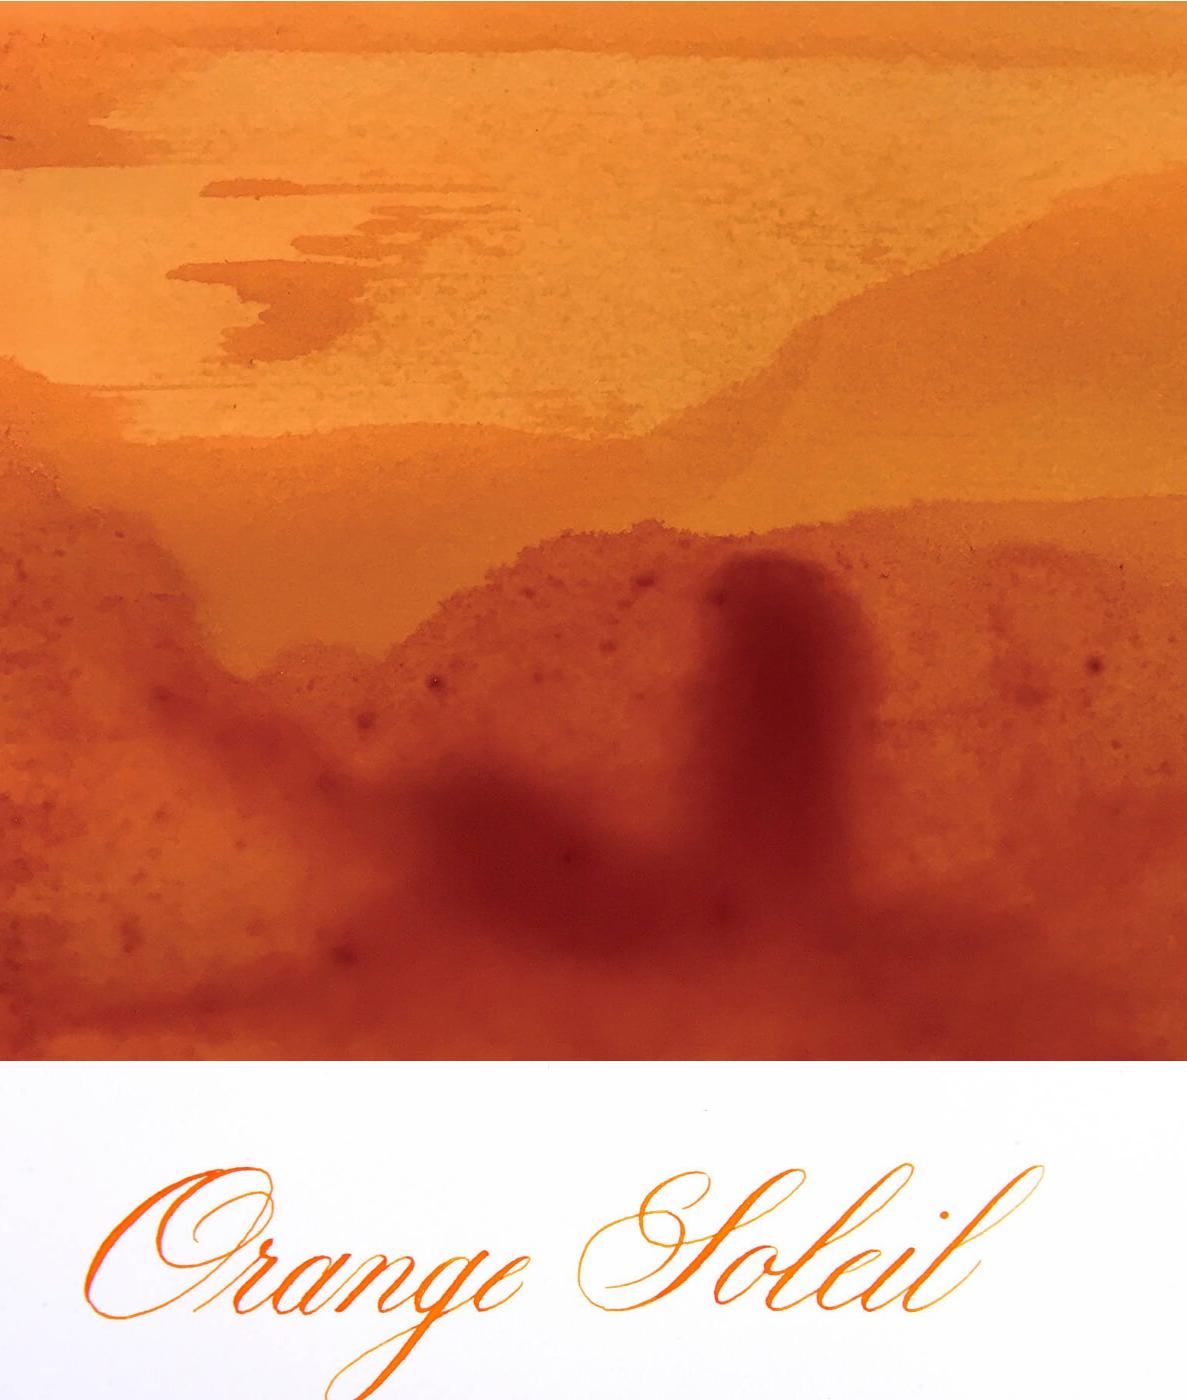 Jacques Herbin  - Orange Soleil Ink Sample 2ml